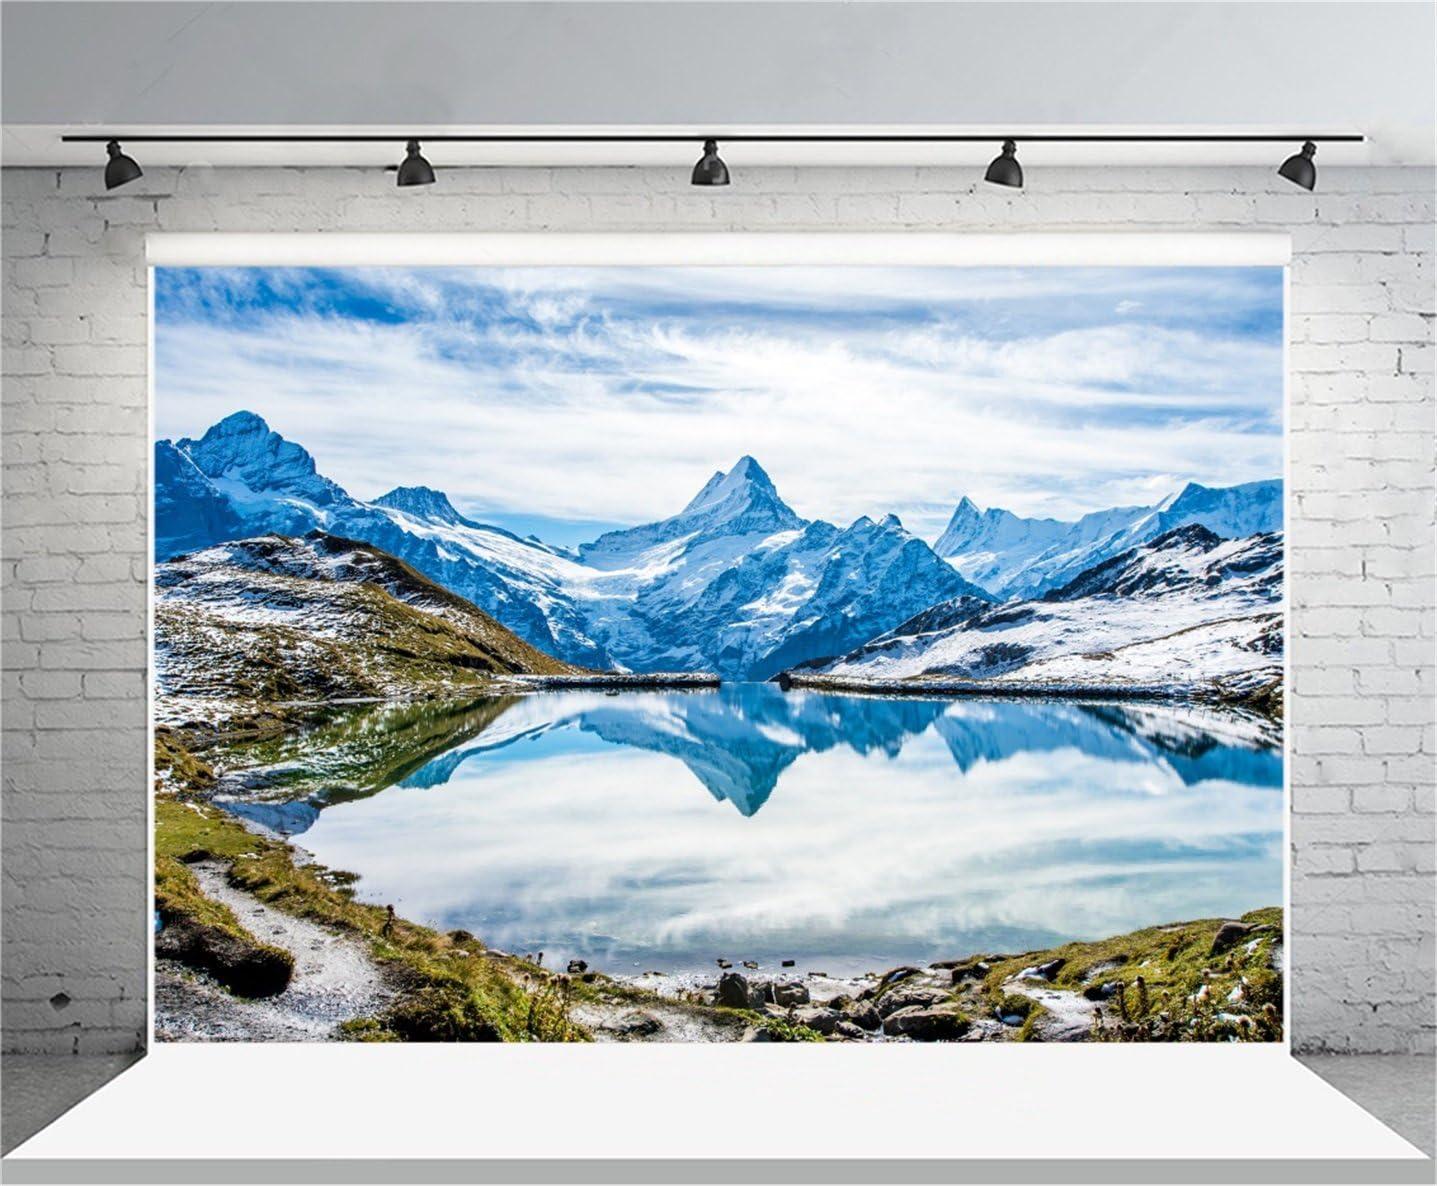 AOFOTO 15x8ft Vinyl Alps Mountain Landscape Backdrop Switzerland Spring Travel Natural Scenery Grassland Snow Mountains Peak Range Lake Background Poster Banner Tour Vacation Photos Prop